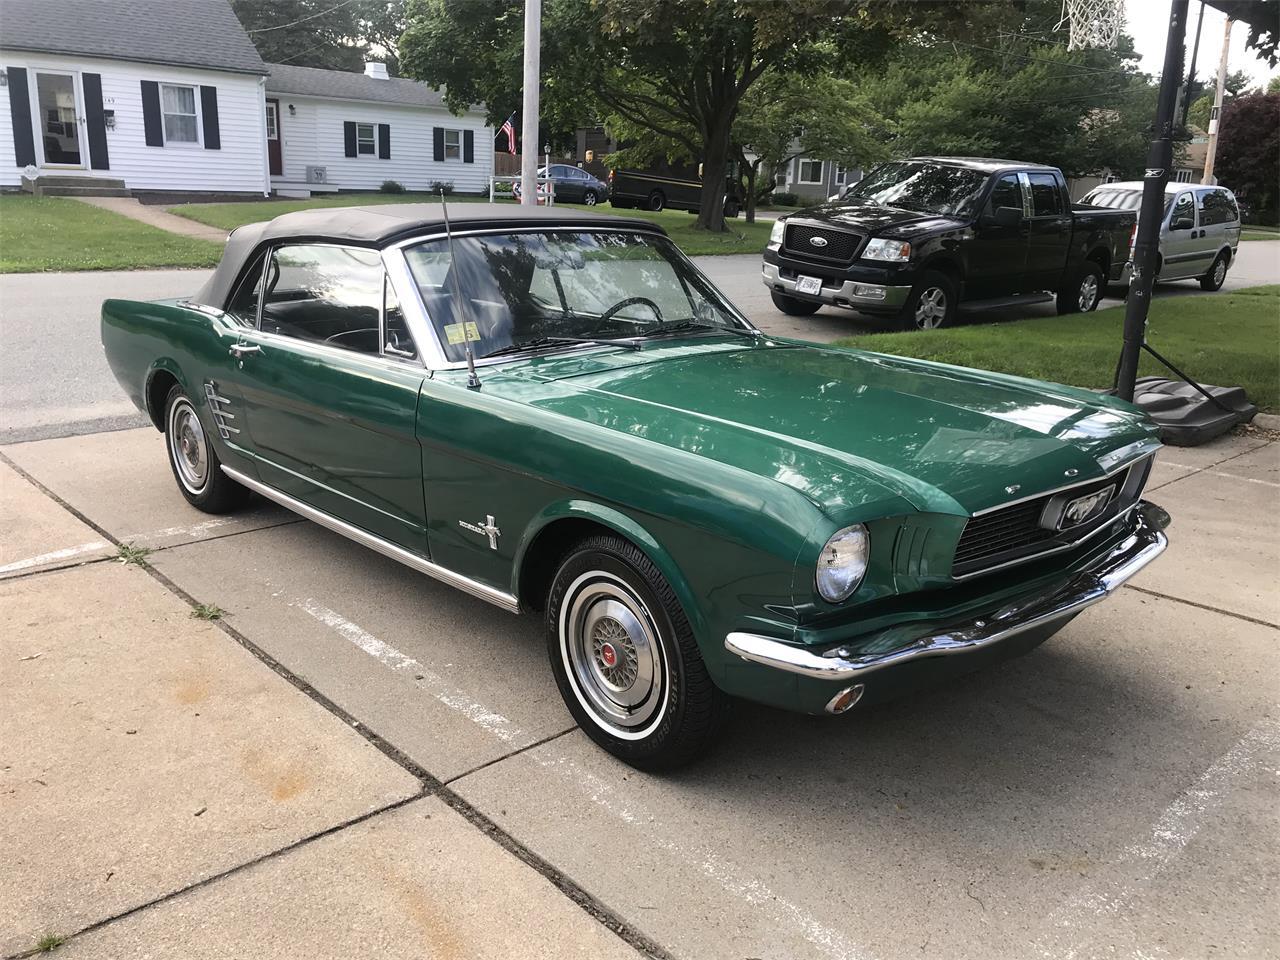 Ford Mustang Expertisée 1966 prix tout compris 1966